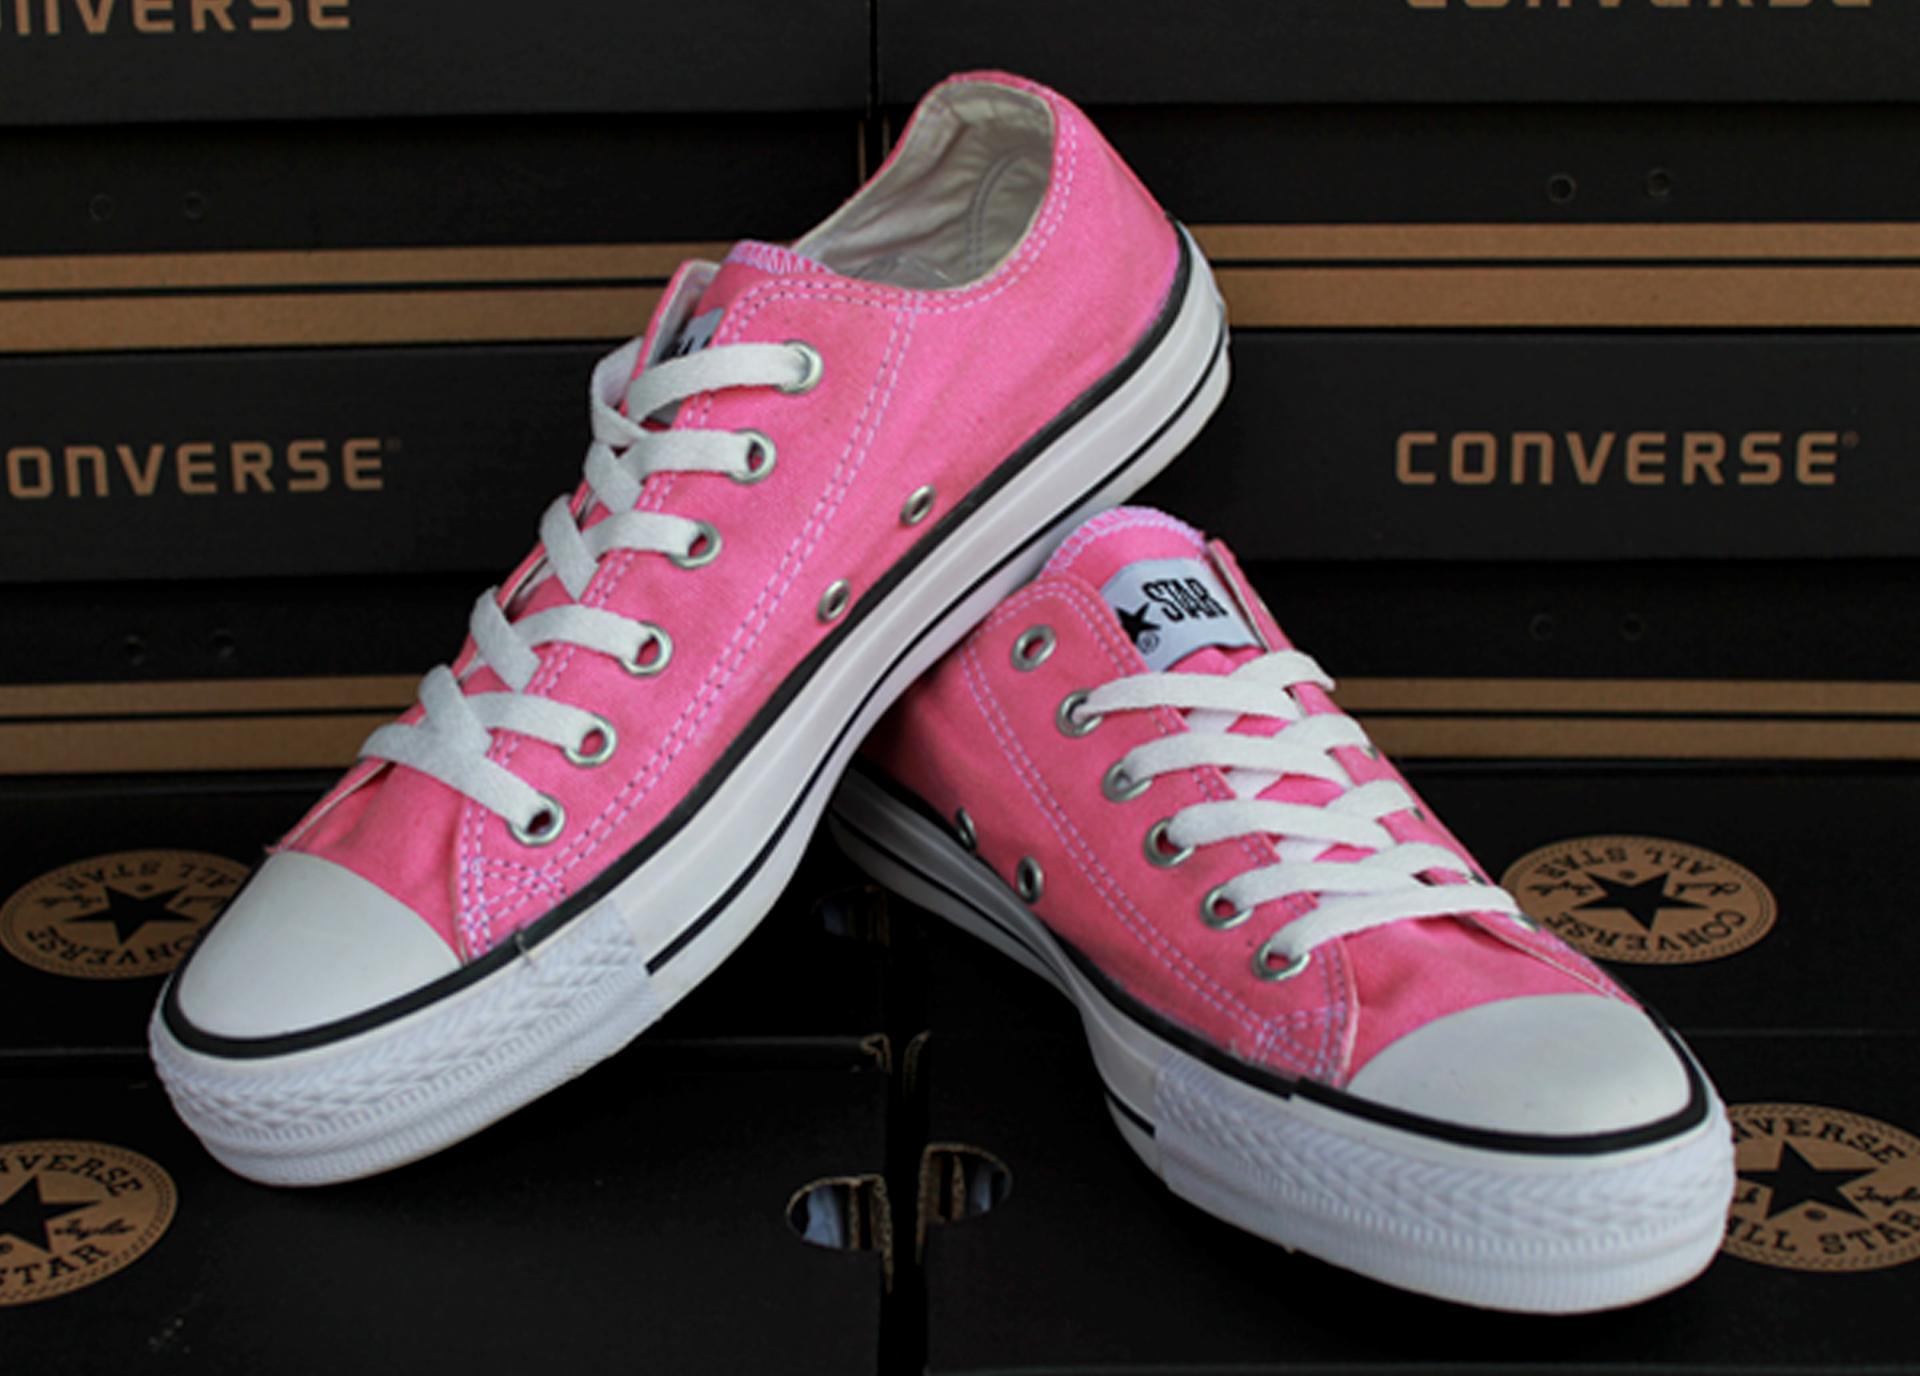 Jual Sepatu Converse All Star Chuck Taylor II Pink (Kets Casual ... 6ee89b9253